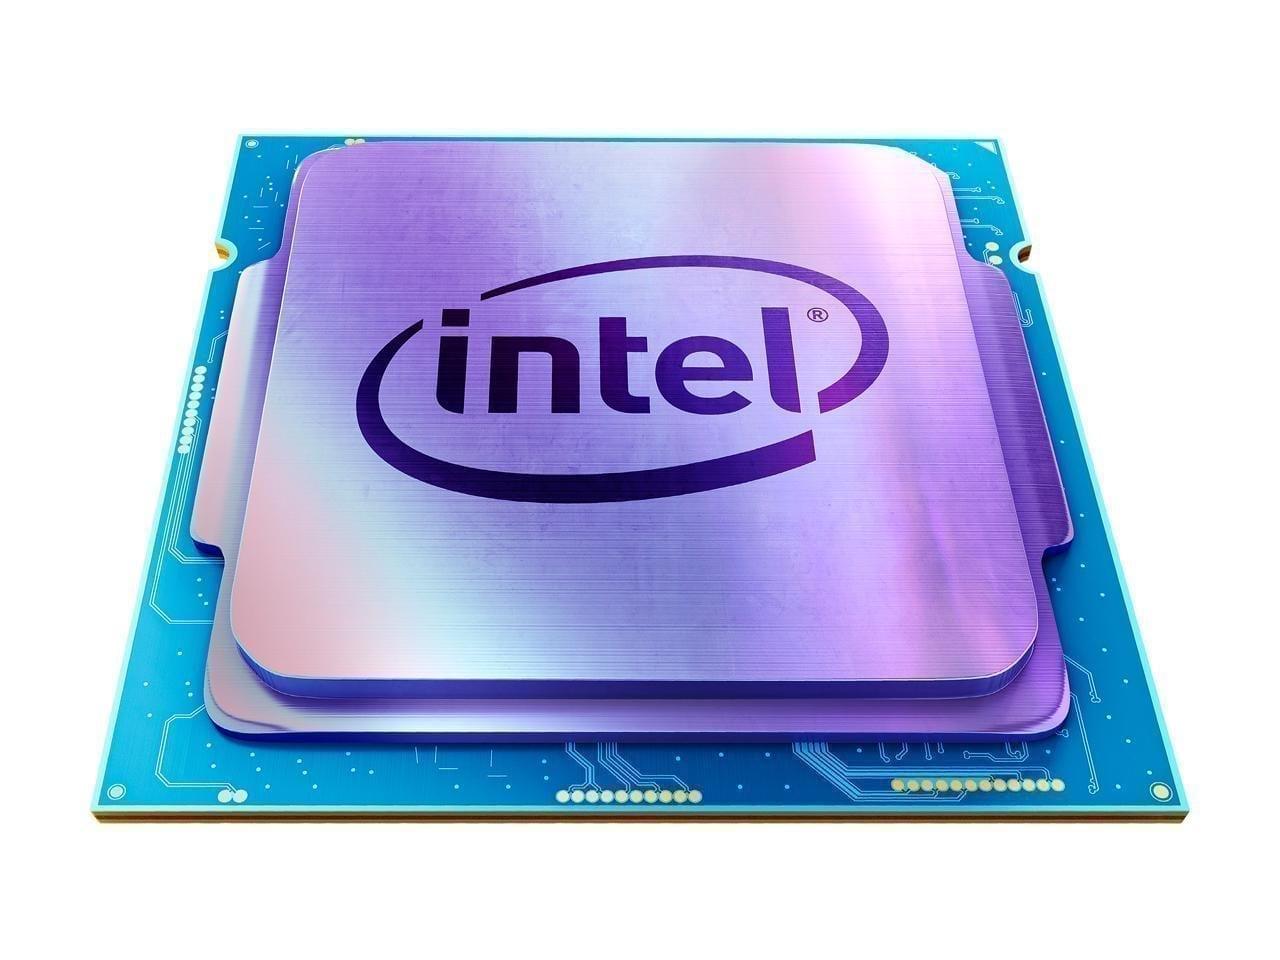 Intel Core i5-10400 Comet Lake 6-Core 2.9 GHz LGA 1200 65W BX8070110400 Desktop Processor Intel UHD Graphics 630 5